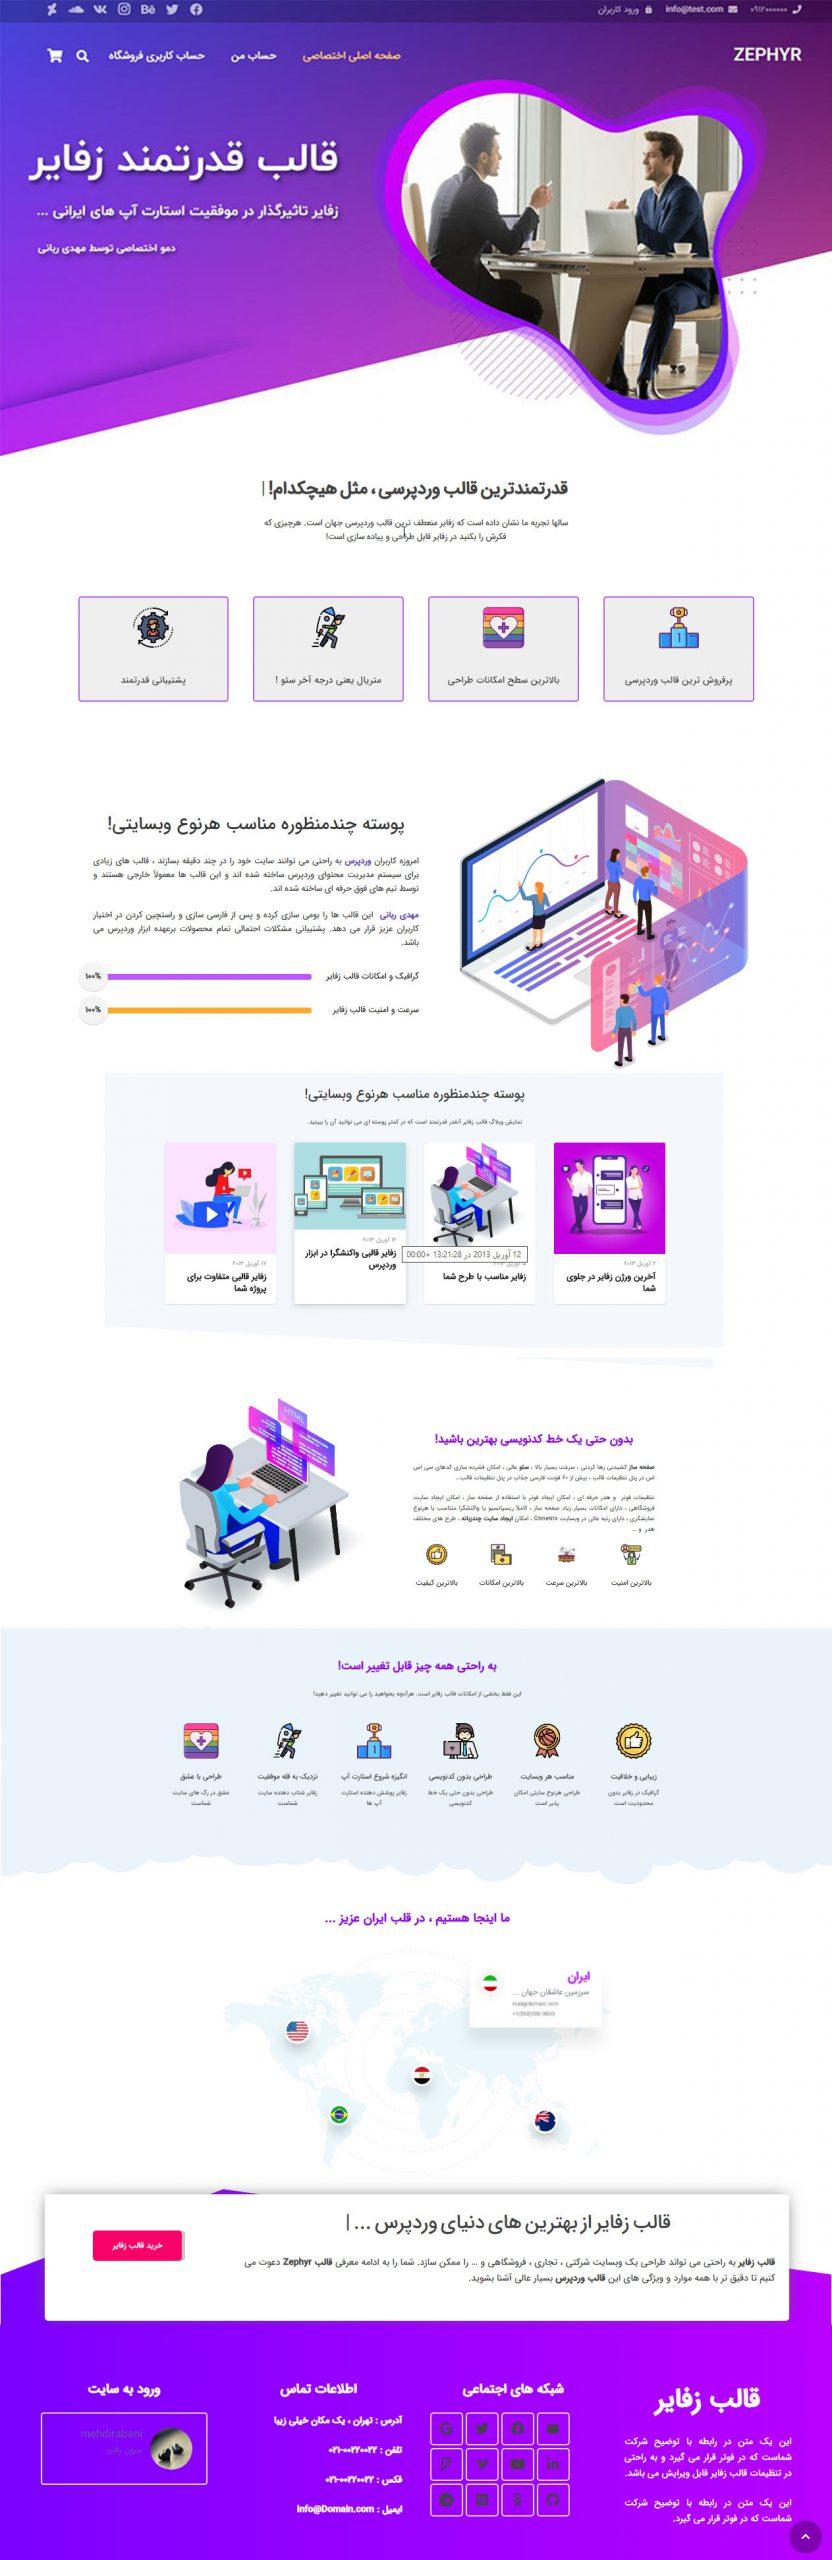 Zephyr WordPress Theme - دانلود قالب زفایر وردپرس | Zephyr WordPress Theme